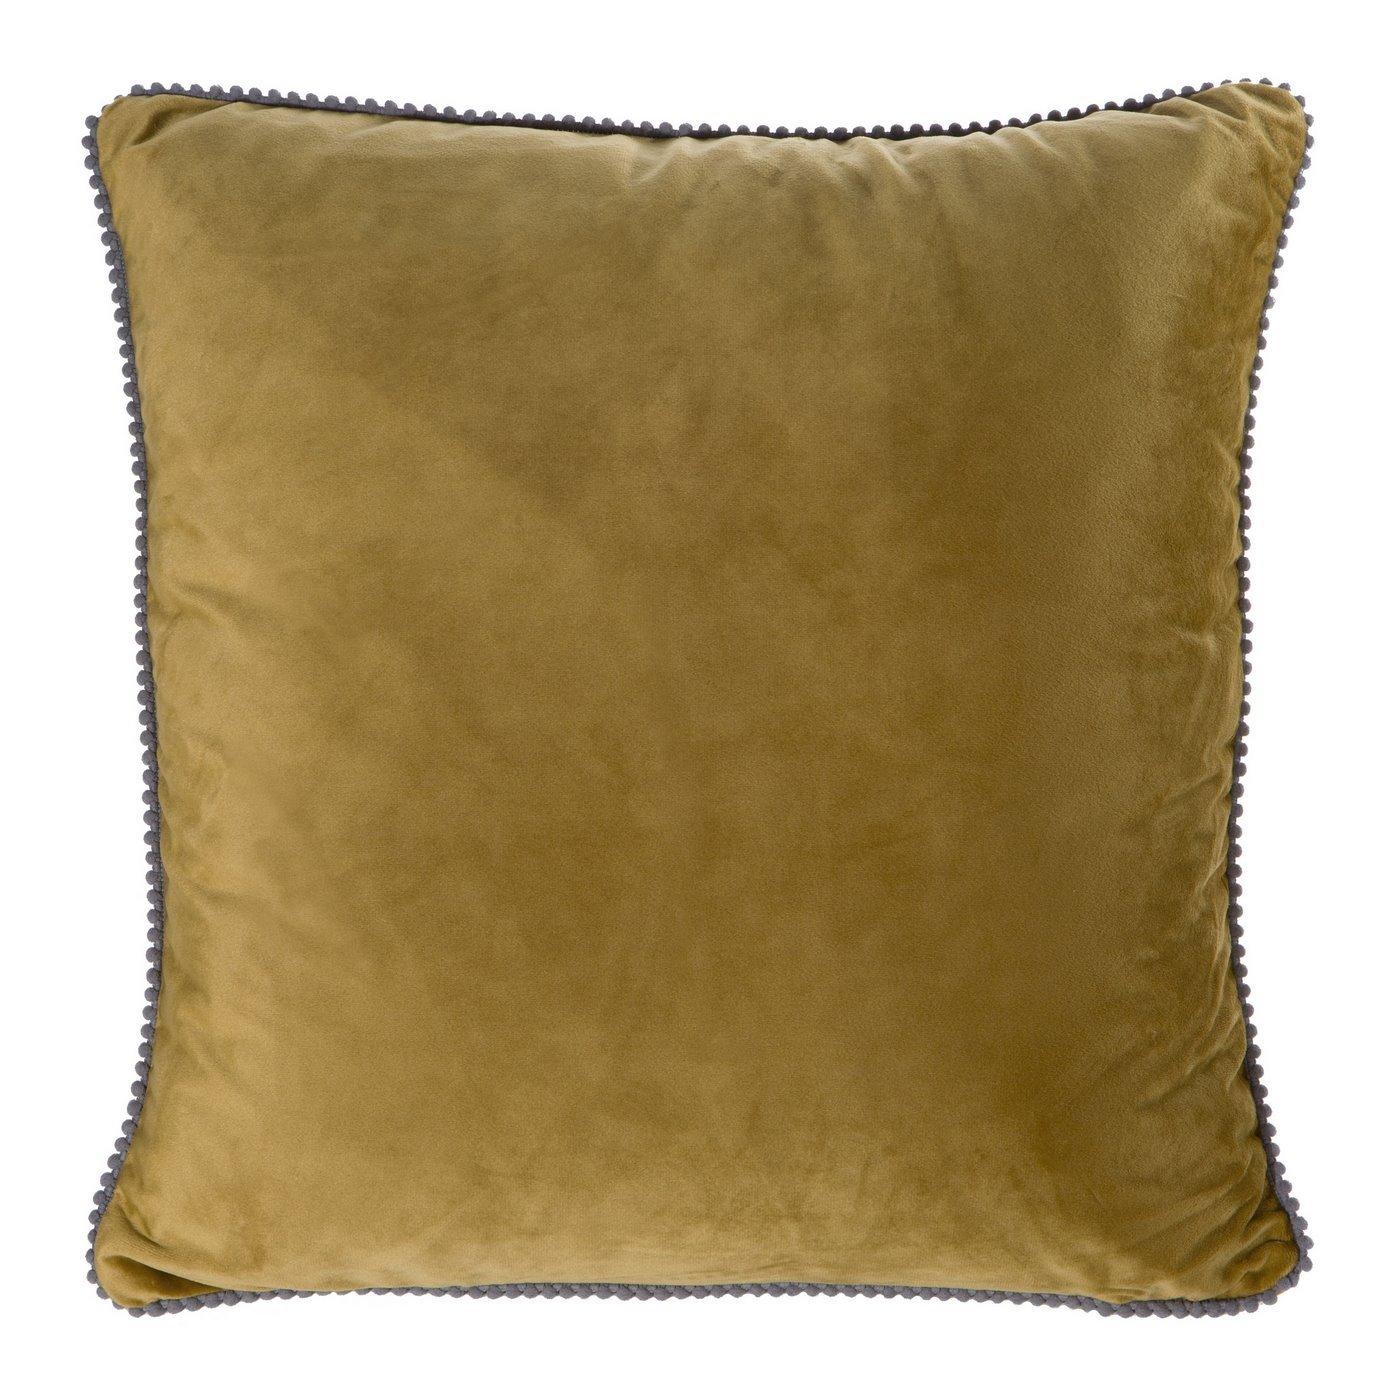 Musztardowa POSZEWKA Z LAMÓWKĄ kontrastową velvet 45x45 cm